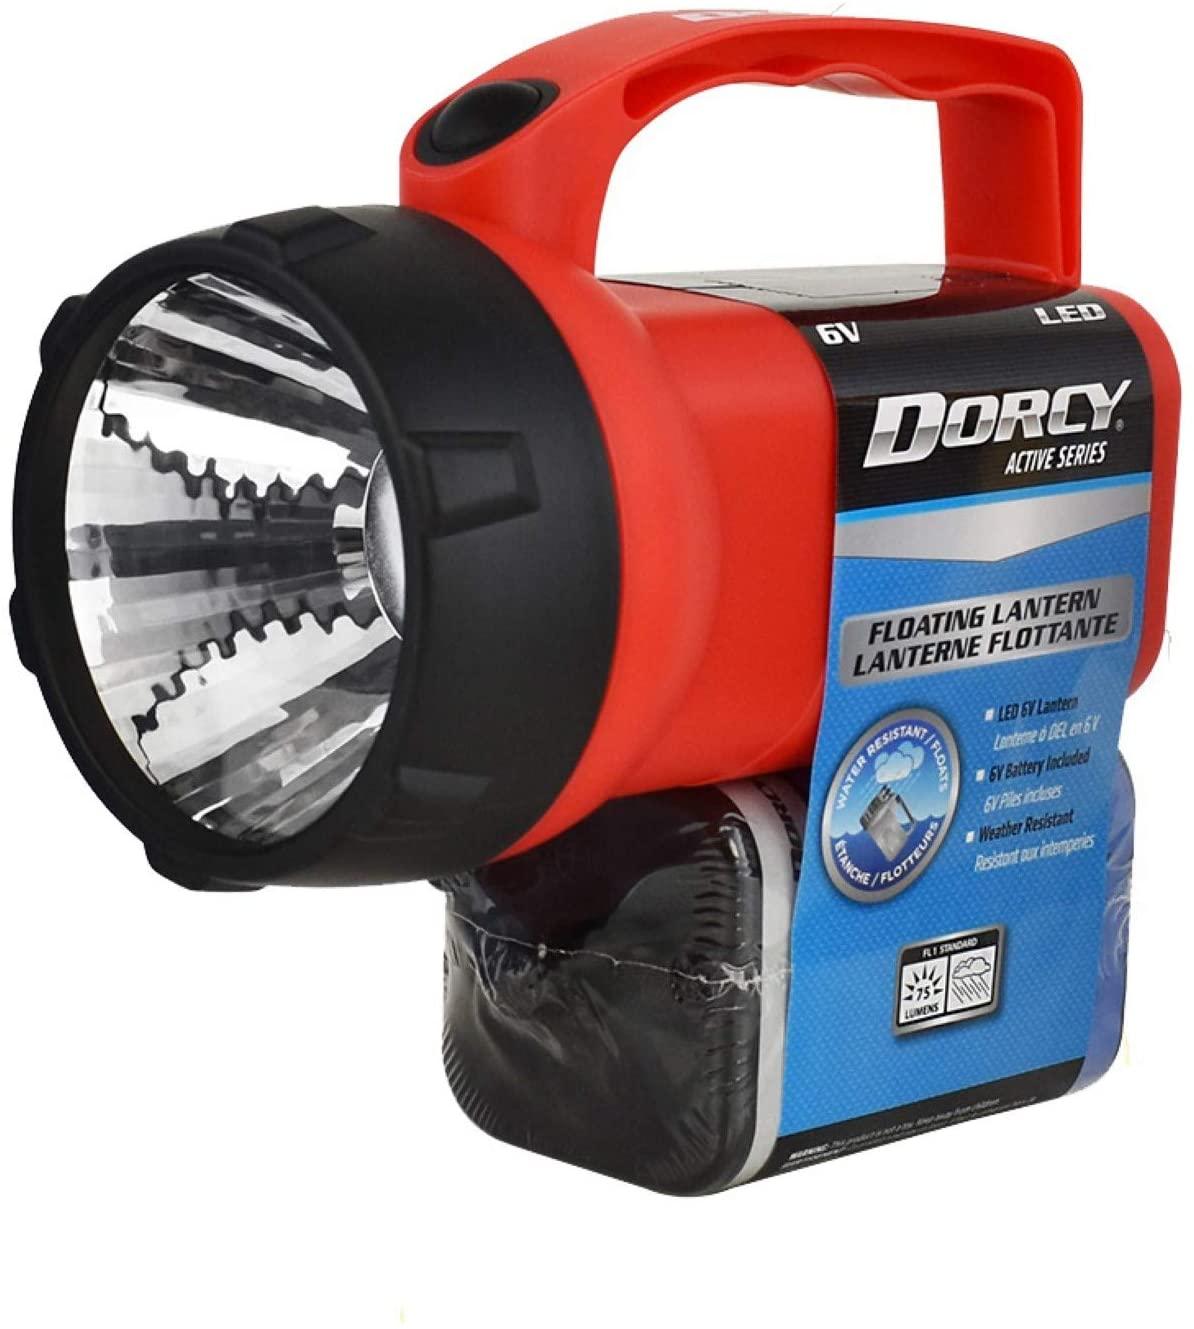 Dorcy 35-Lumen Floating Waterproof LED Flashlight Lantern, Assorted Colors (41-2081)